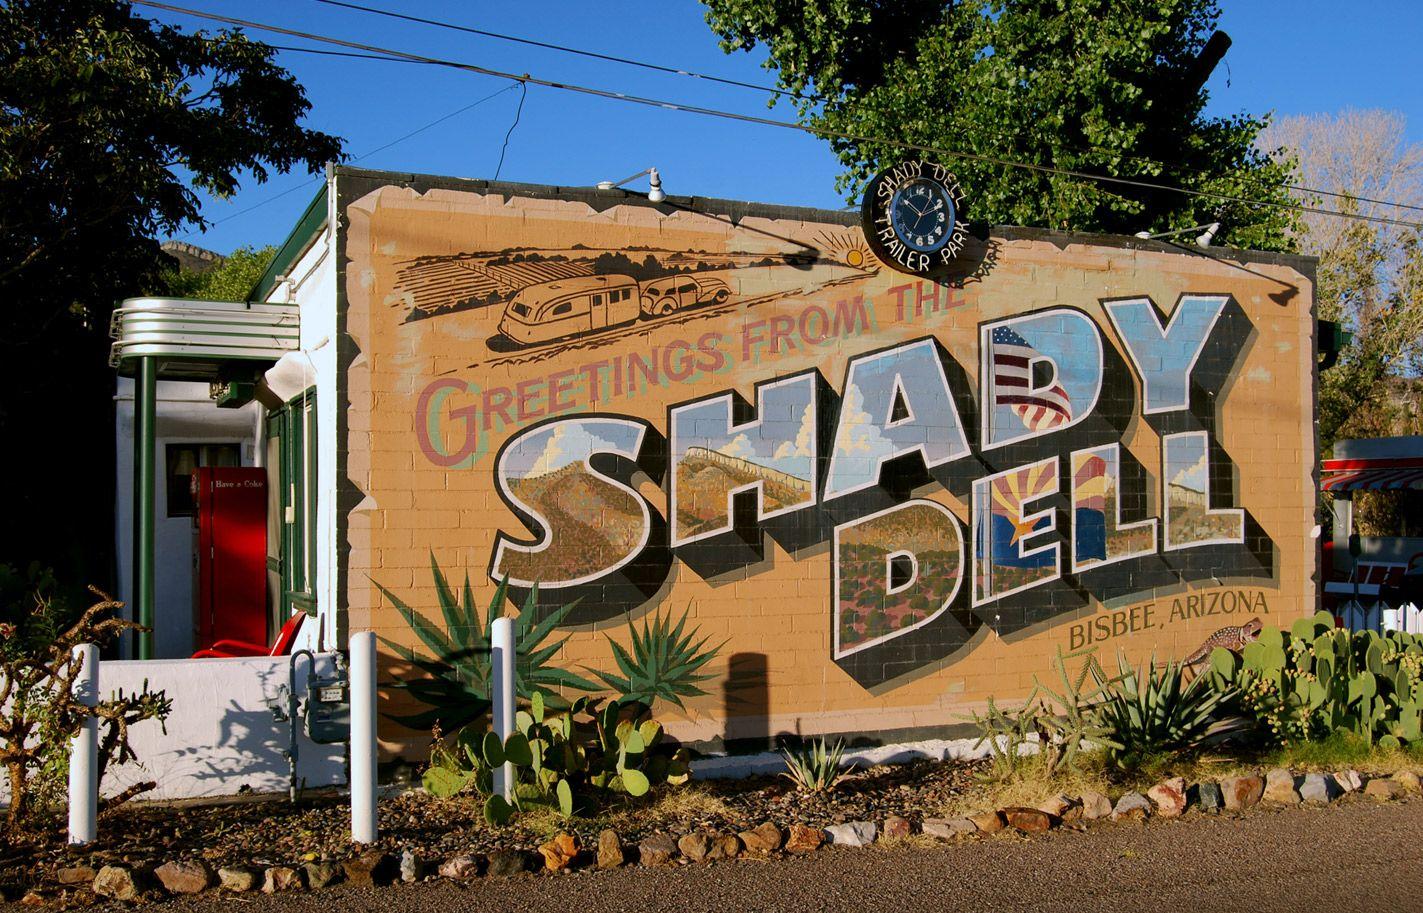 The Shady Dell Bisbee Arizona Plus 18 Wacky Hotels In United